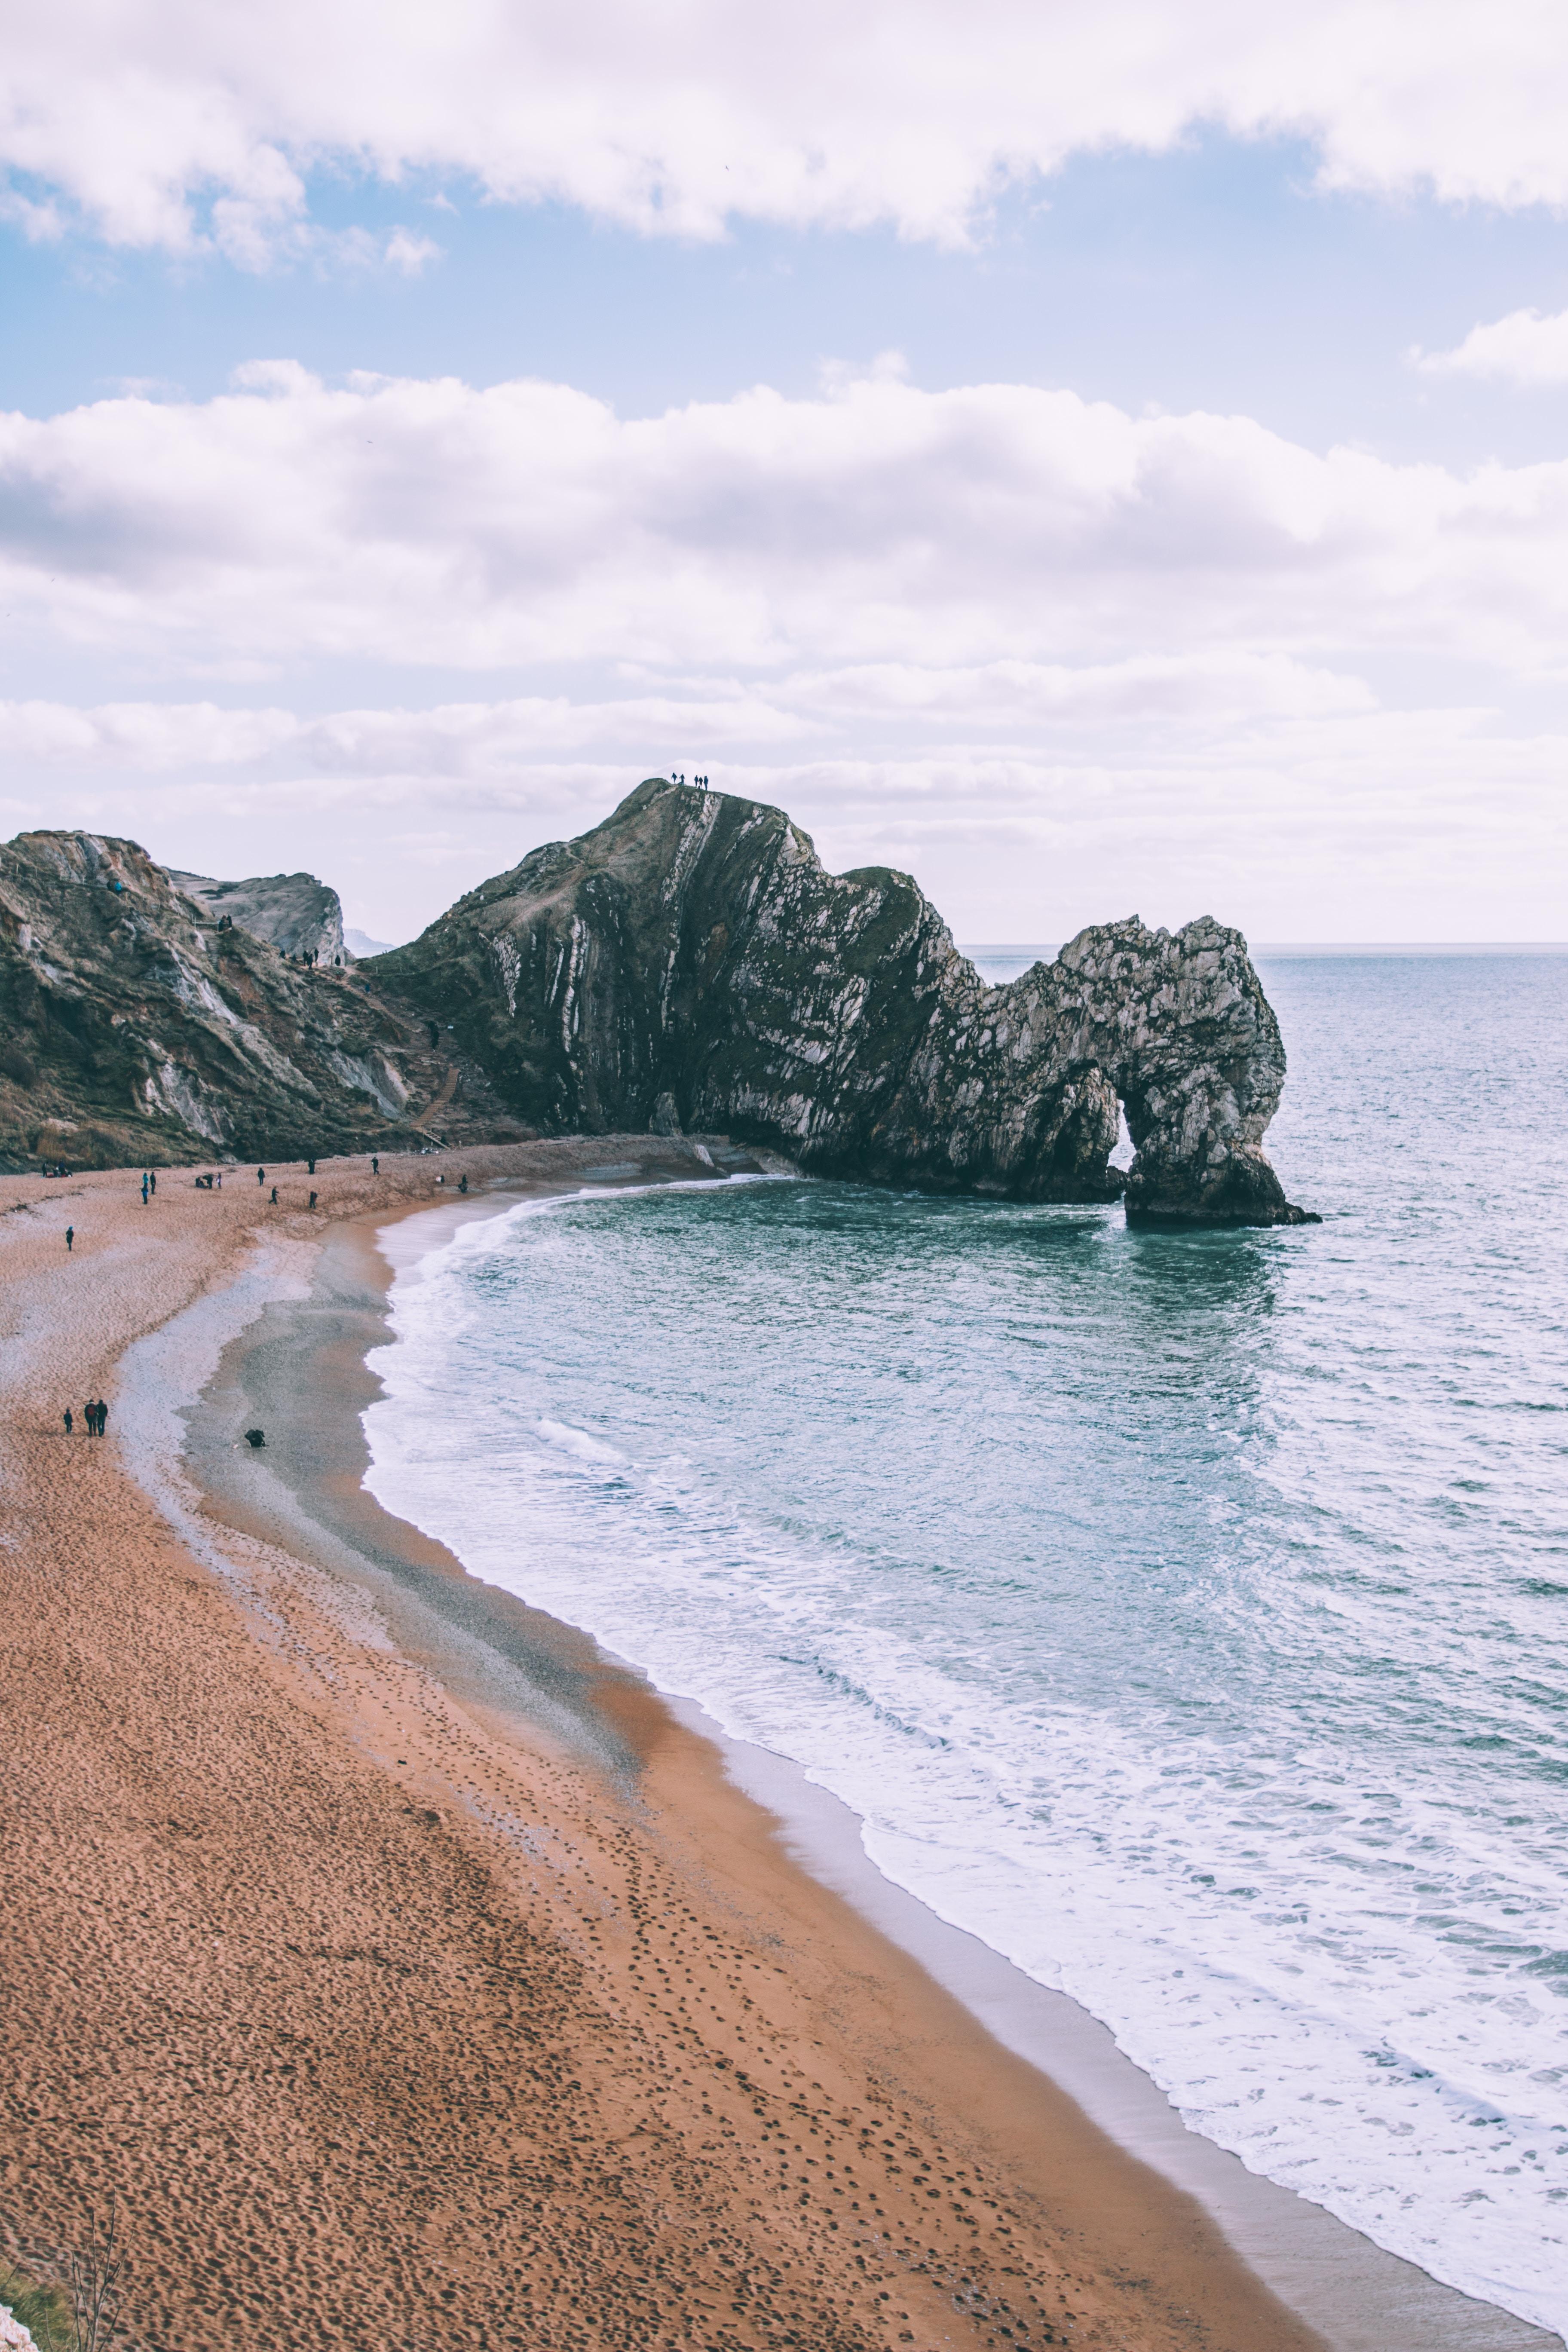 Cliffs on the sand beach shoreline at Durdle Door